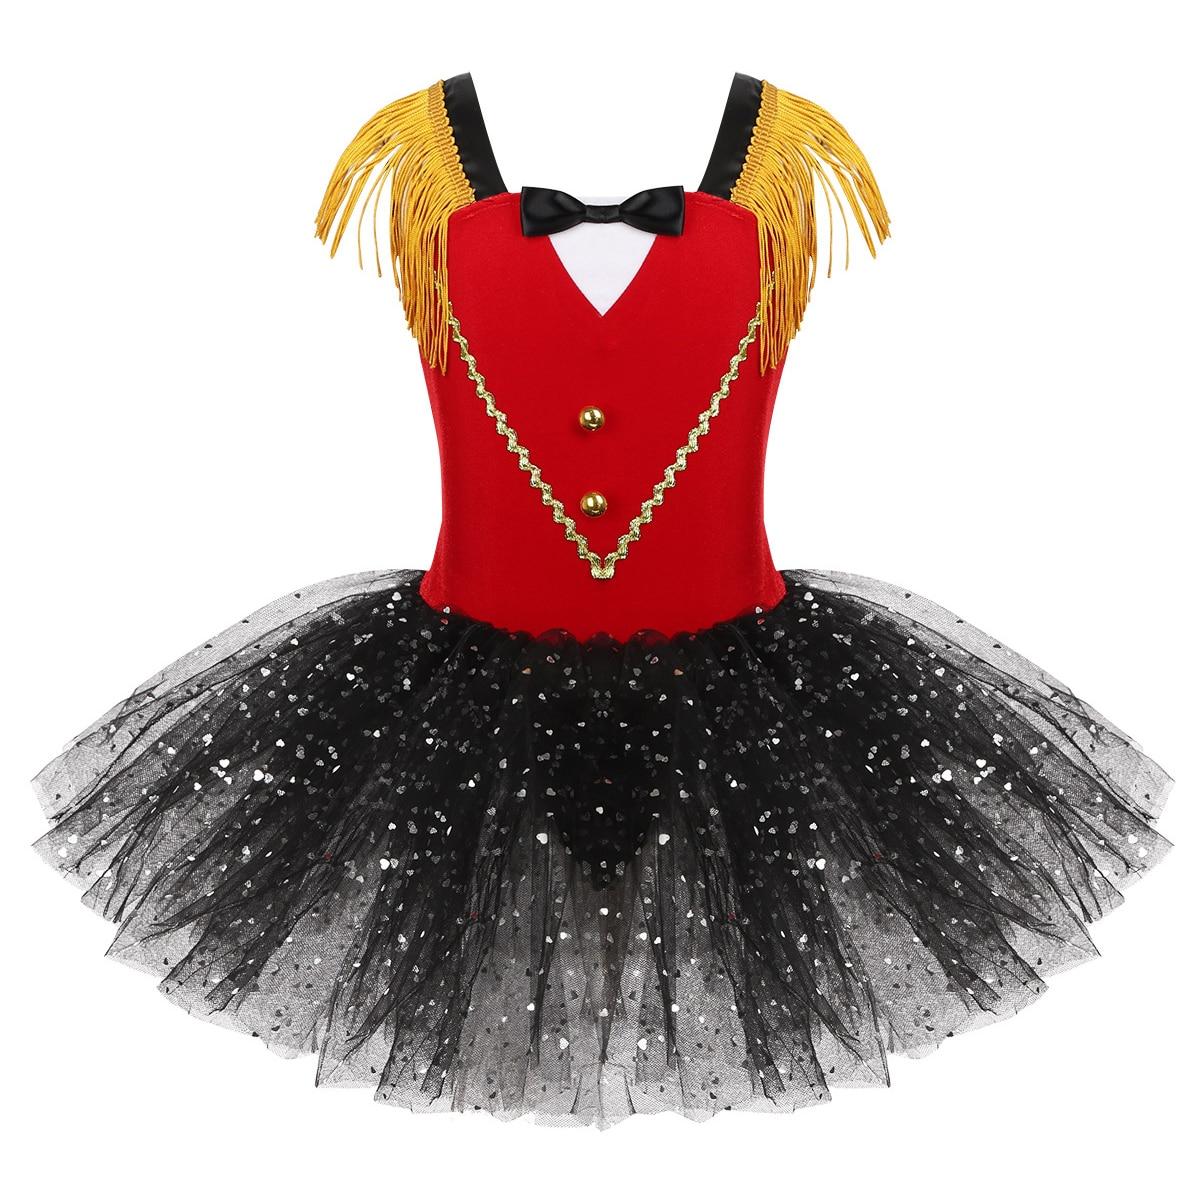 Toddler Ballet Dress Girls Leotard Dance Sequins Tutu Skirts Performance Costume